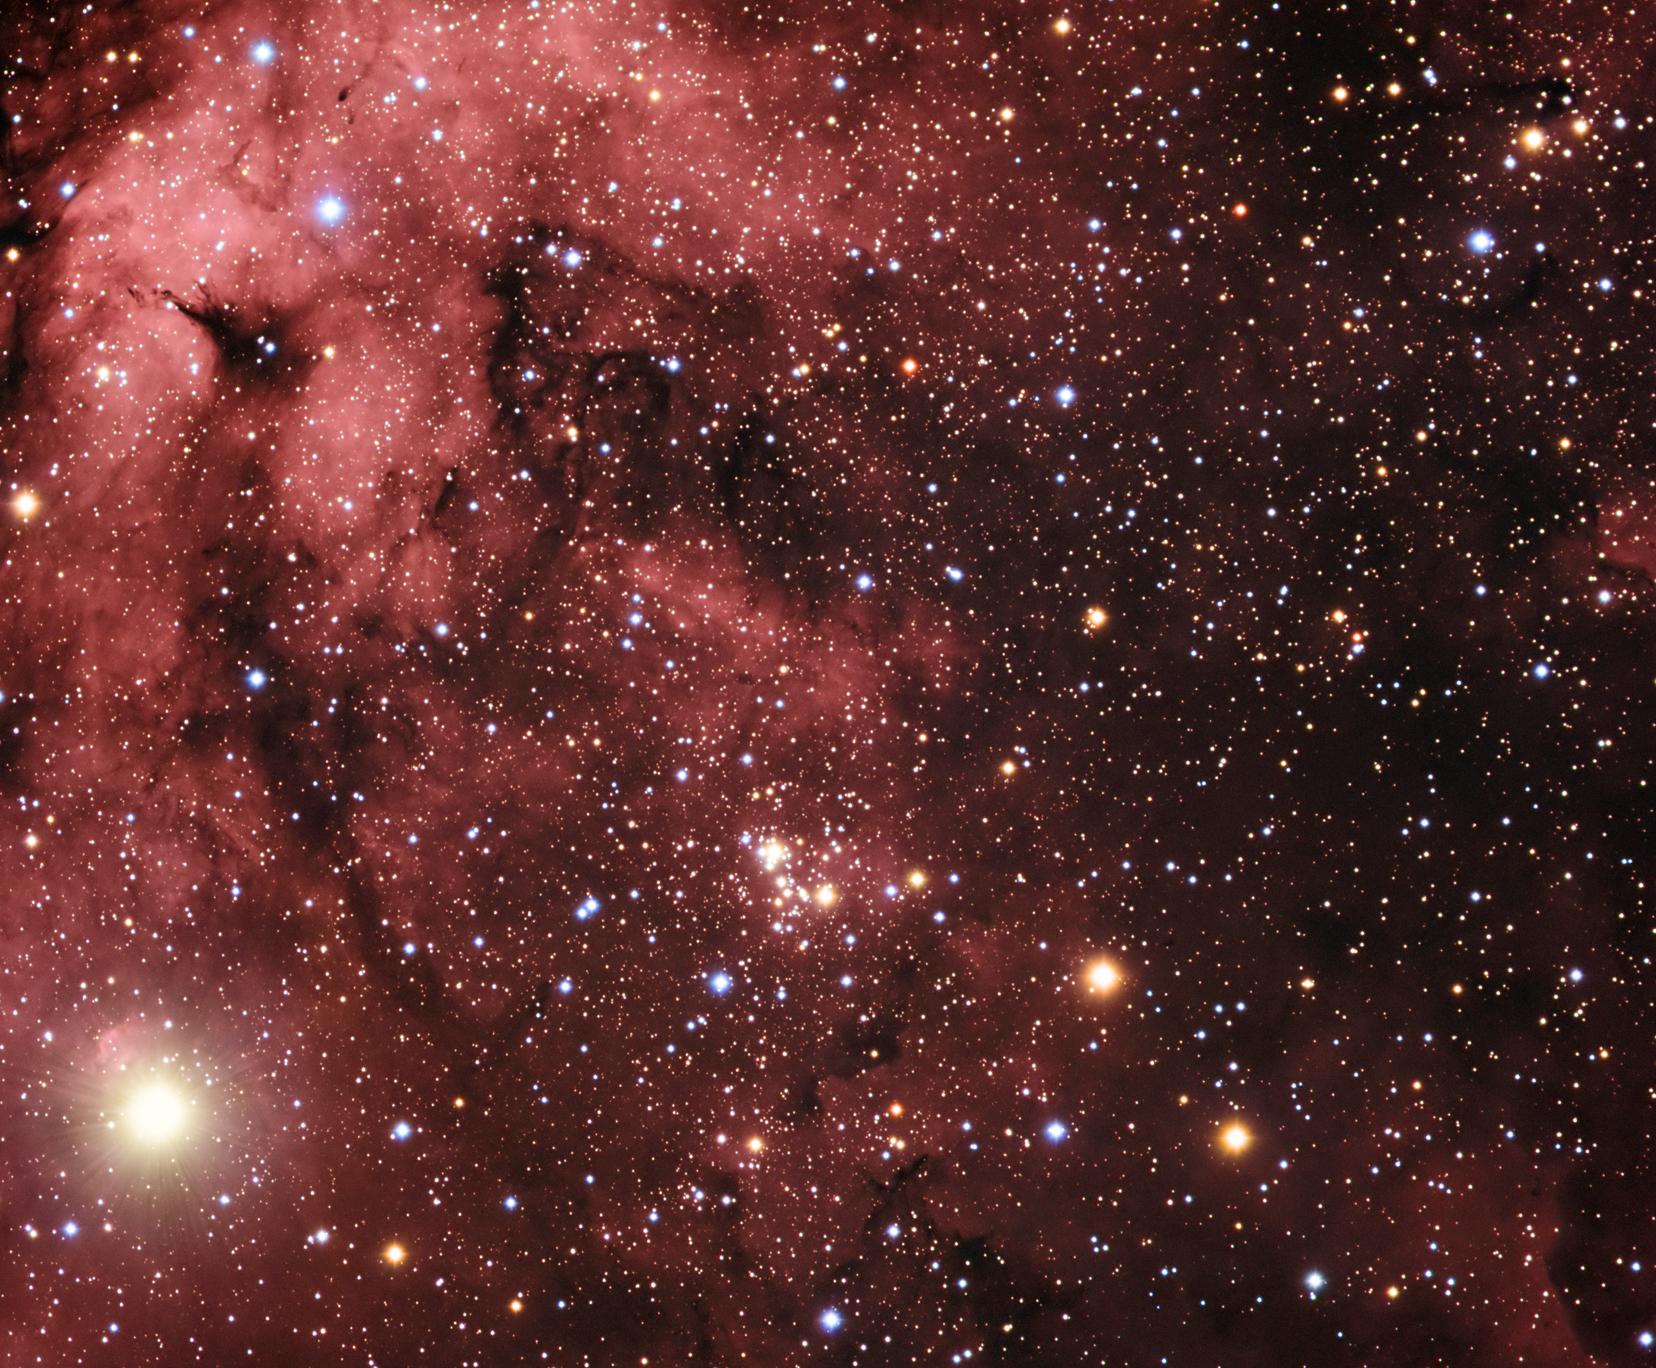 NGC6910-IC1318-LRGB-20150710-2344-sx-600s-TTK